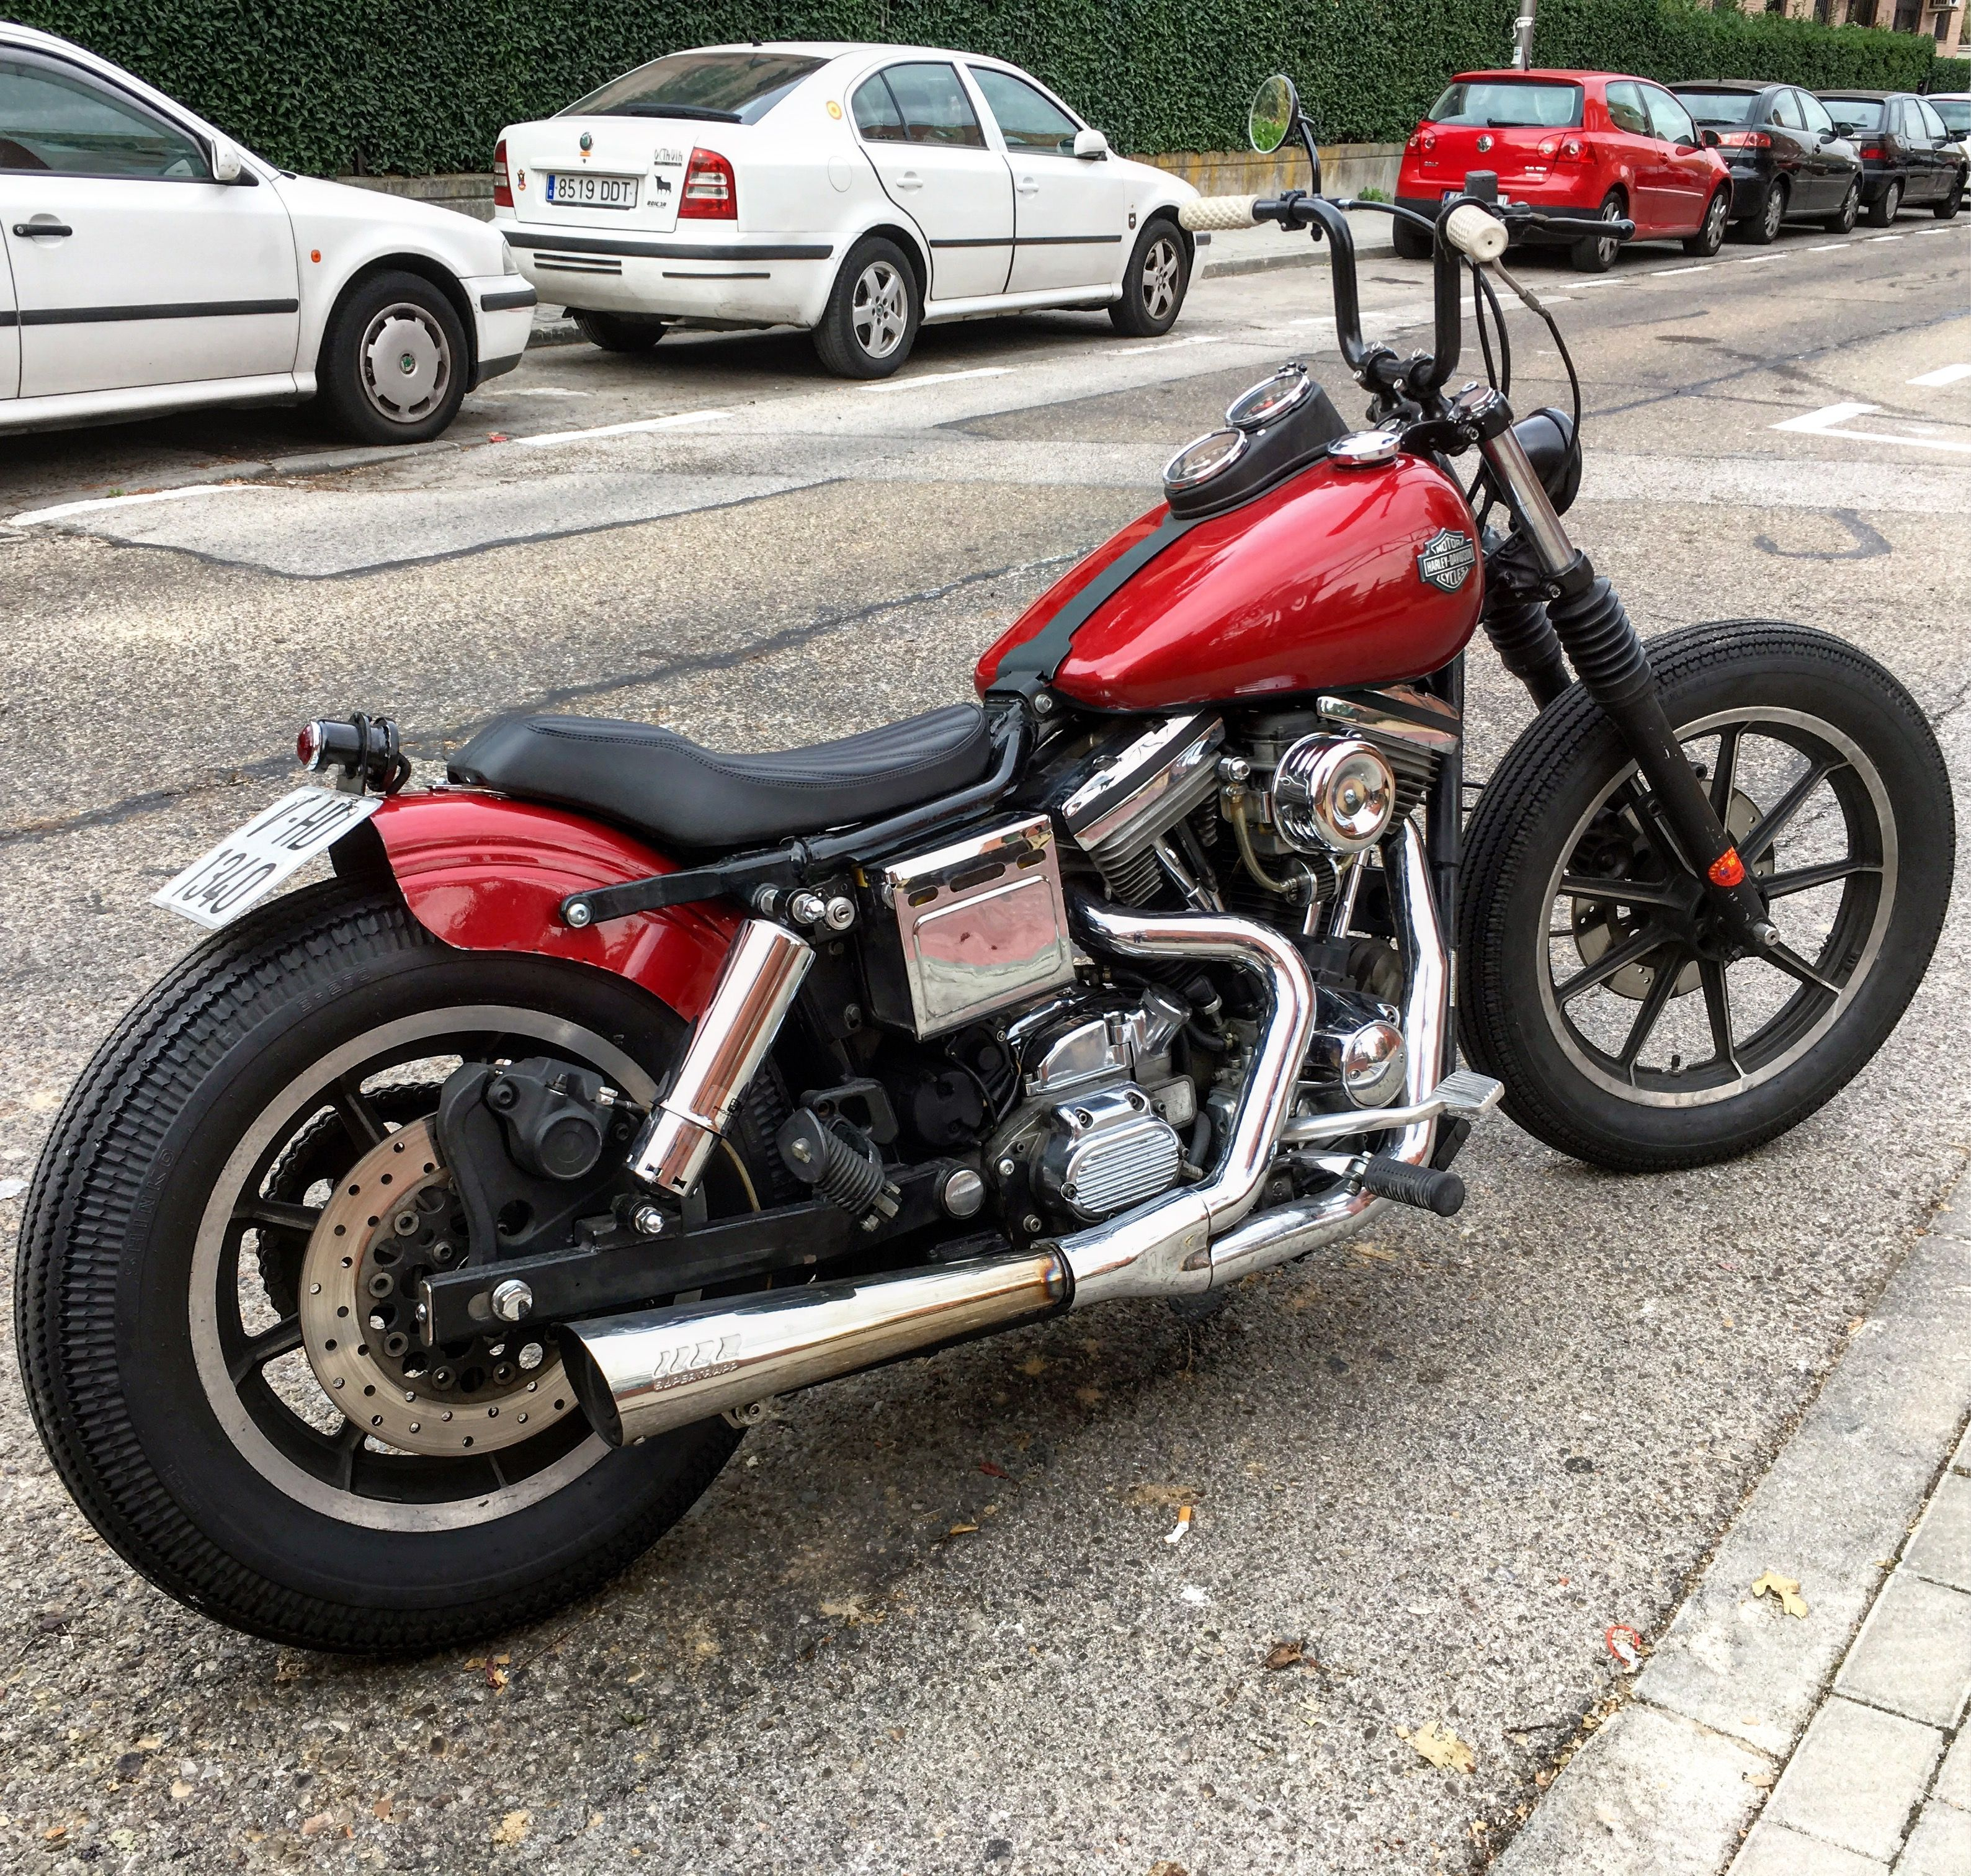 Pin By Giacomo Feltre On Dynas Harley Davidson Dyna Harley Davidson Dyna Super Glide Harley Davidson Bikes